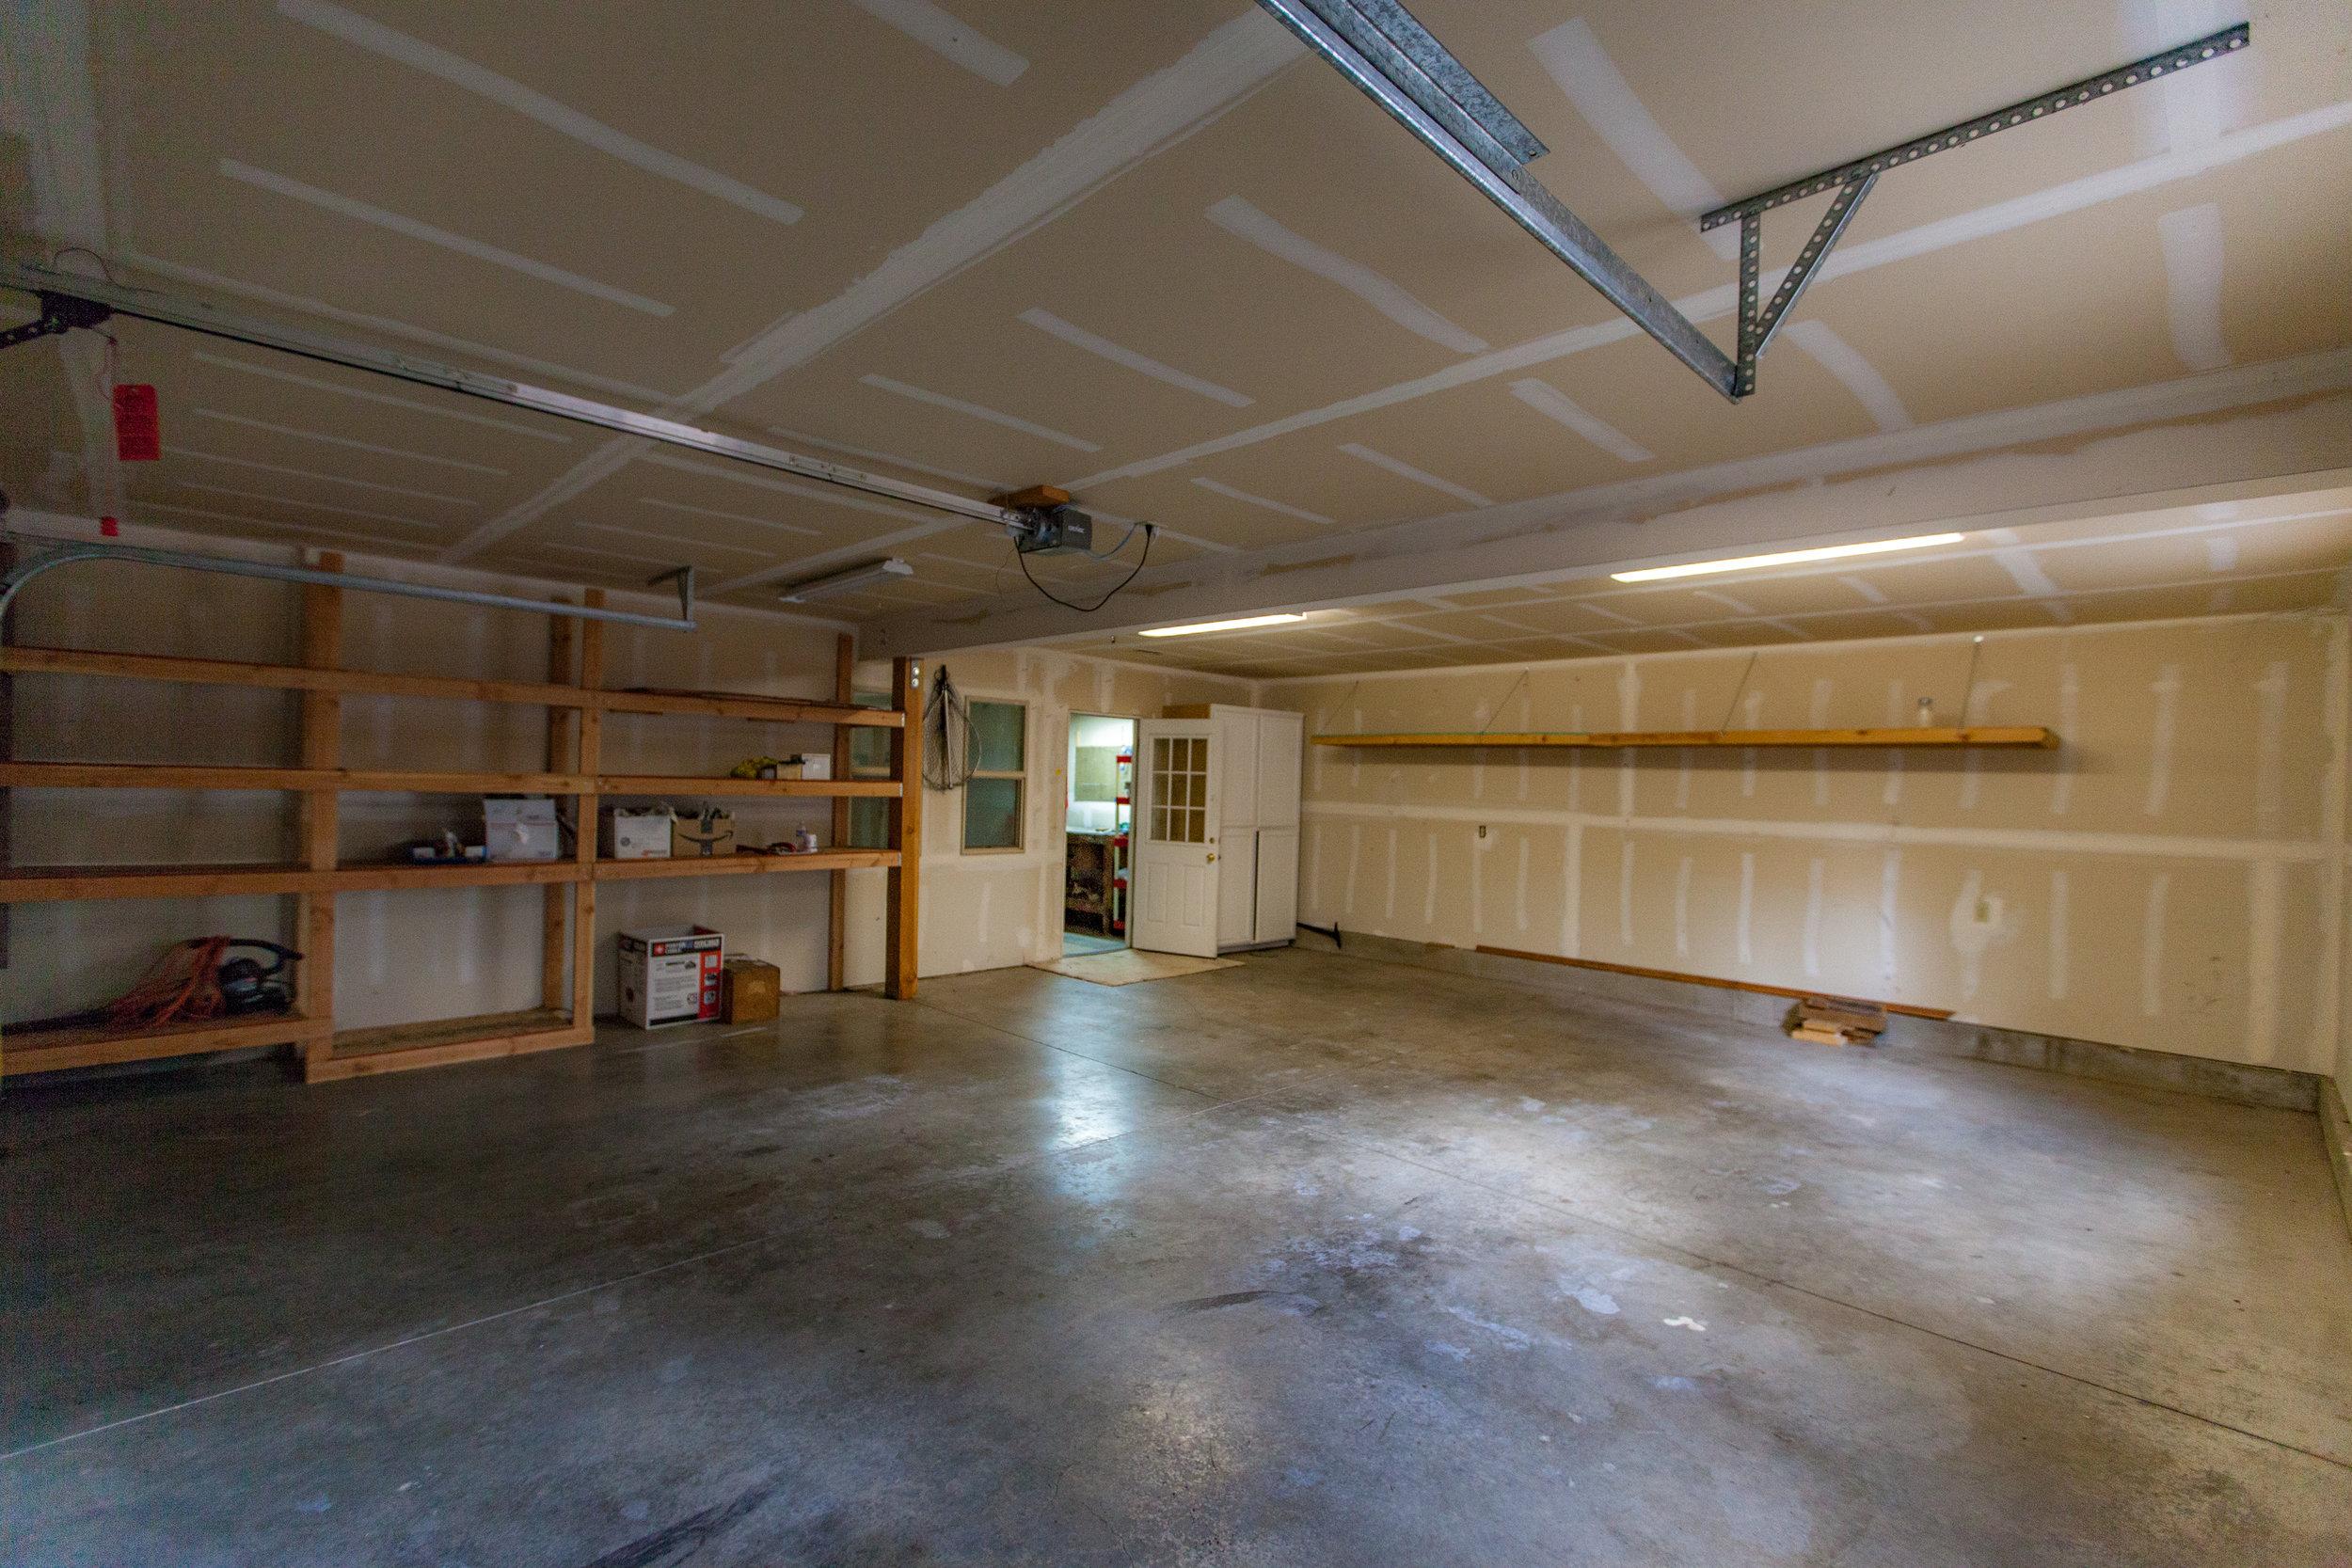 Garage Bay 1 View 2.jpg